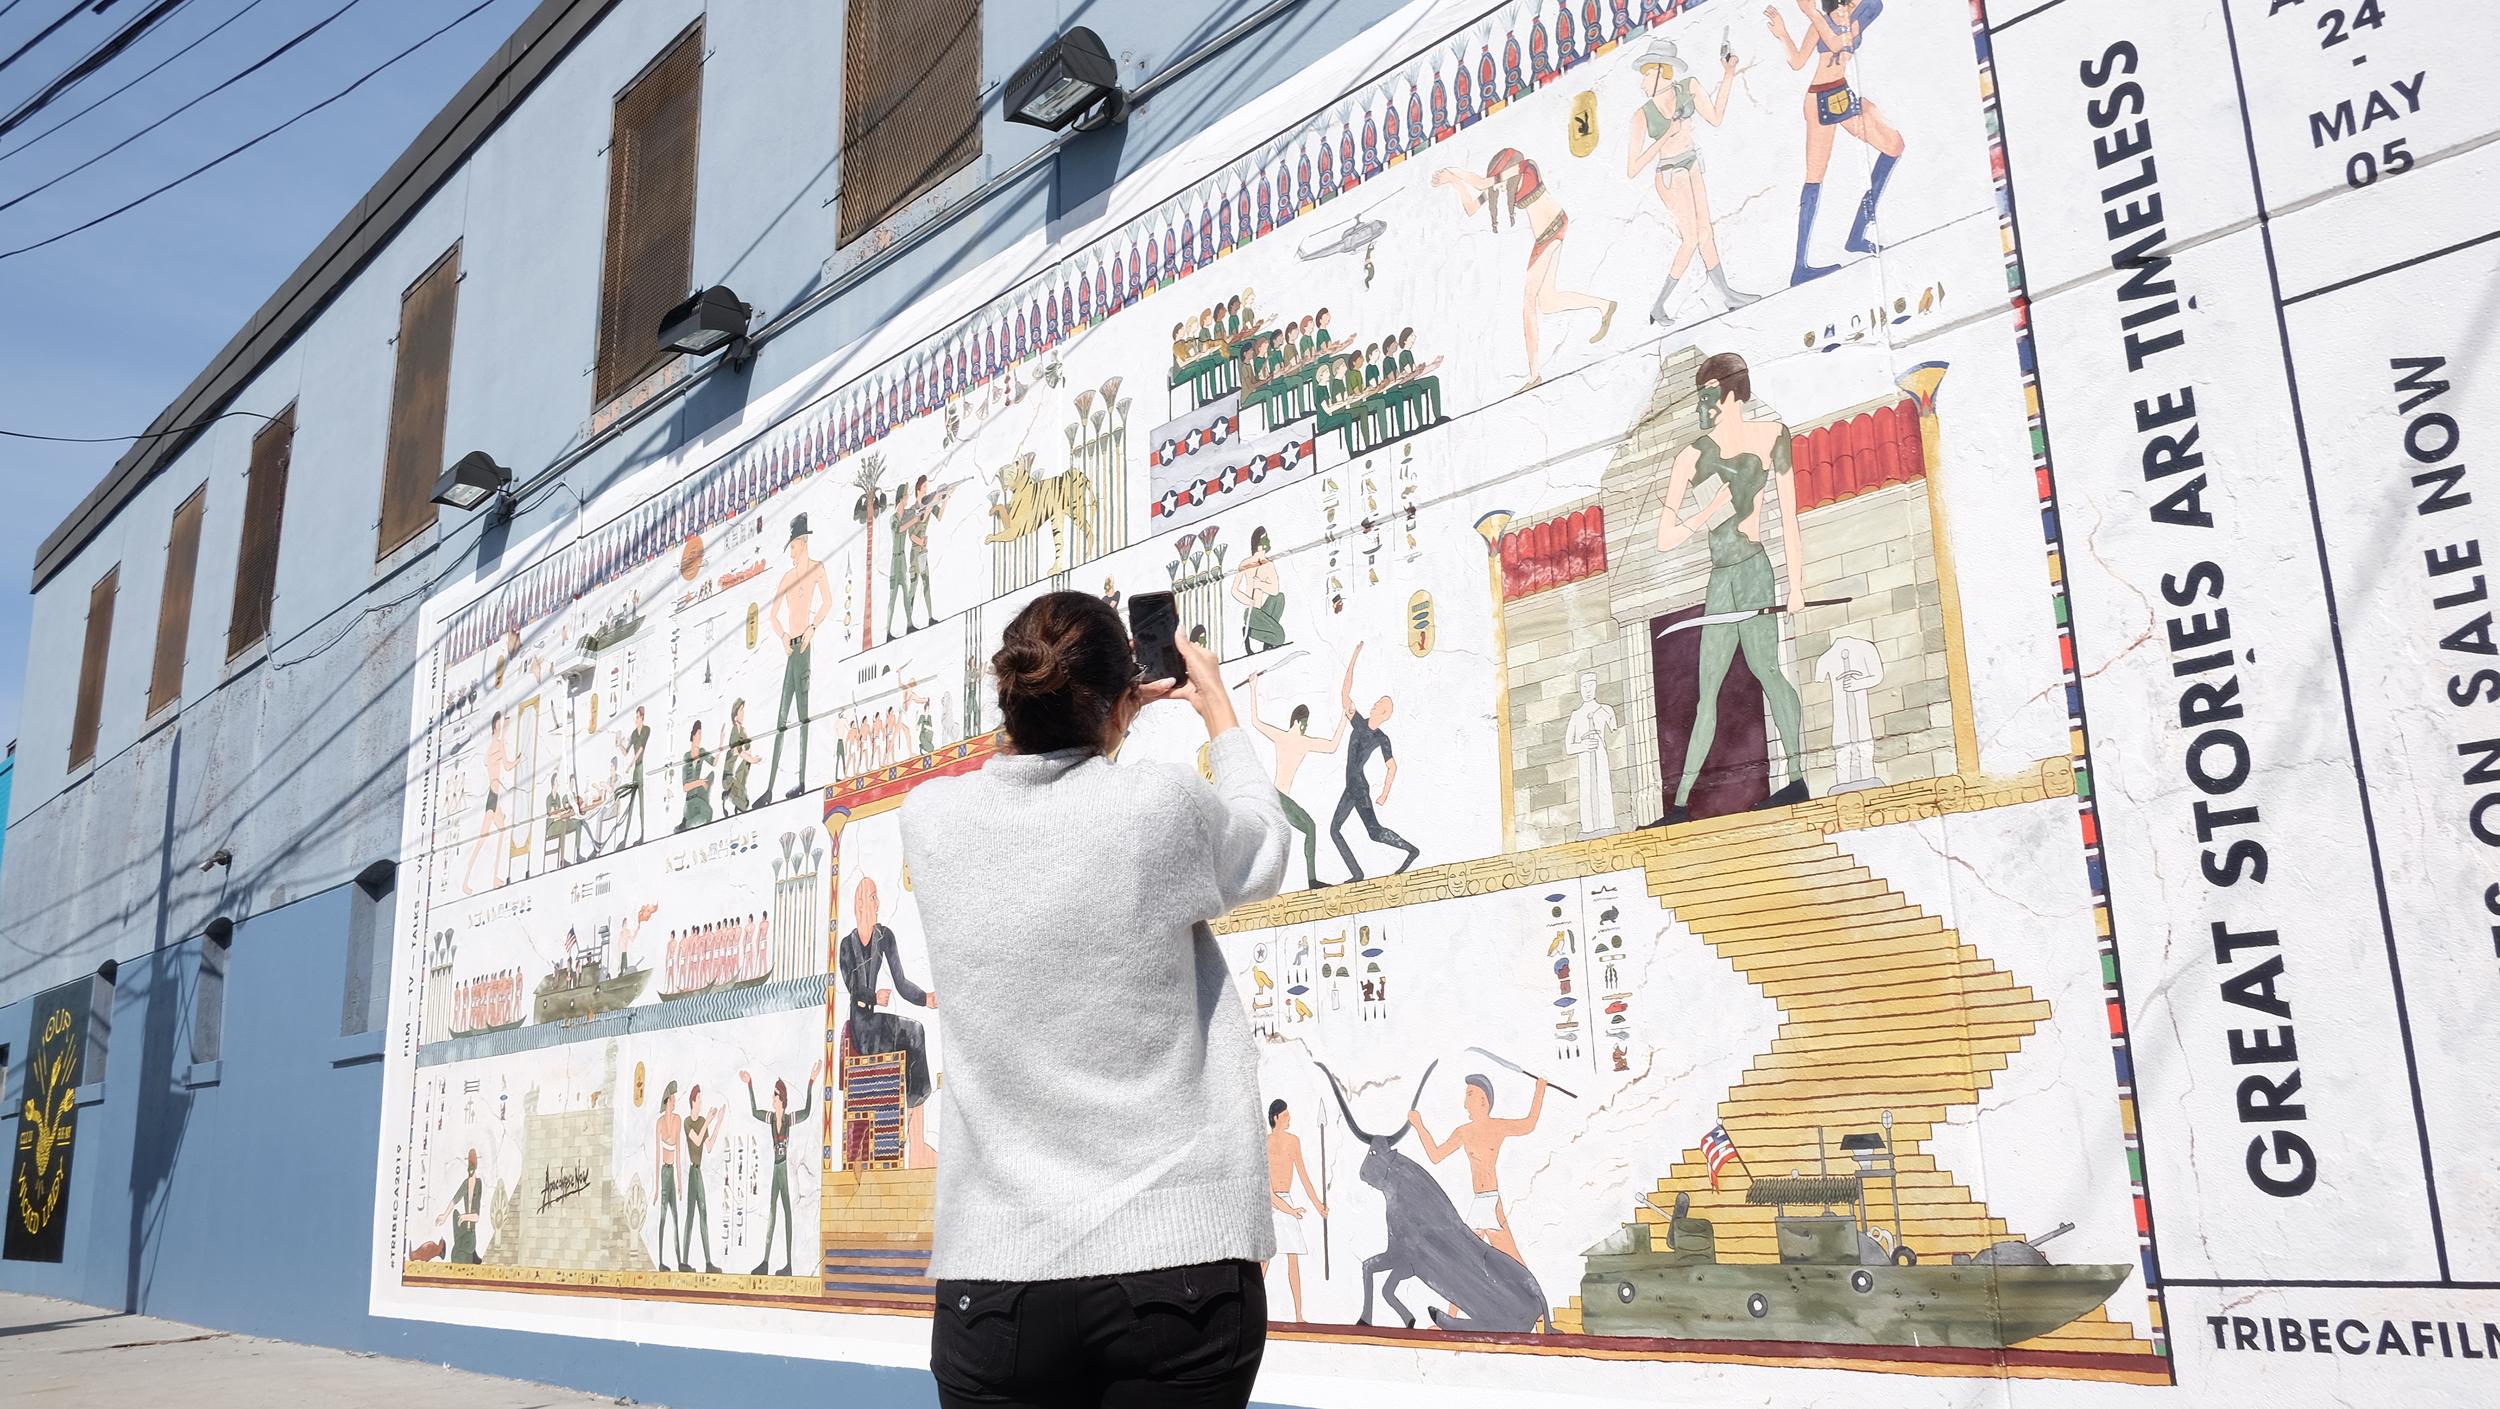 DDBNY_Tribeca_ApocalypseNow_mural.png